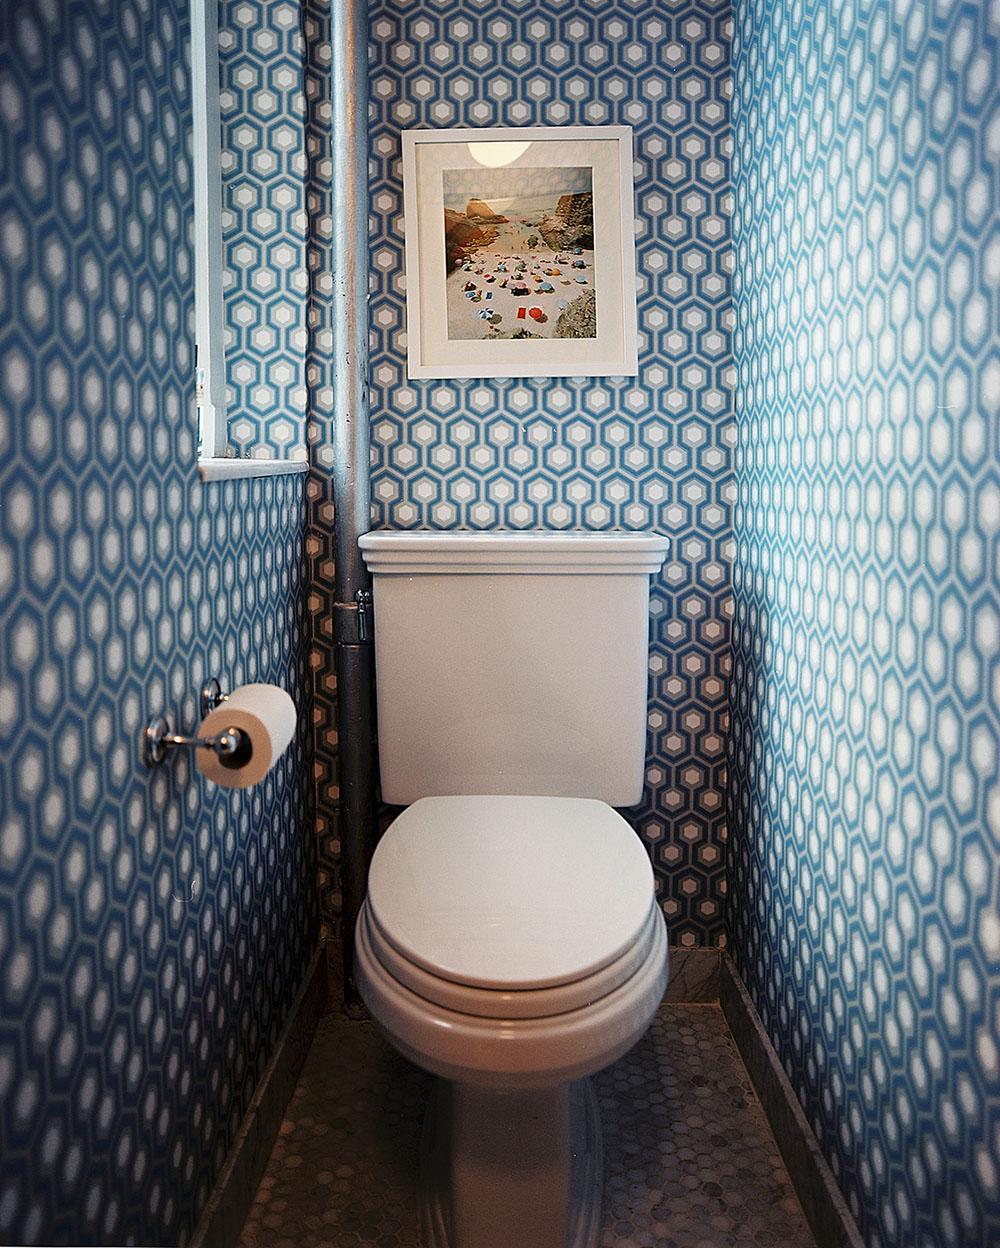 Обои в туалете с геометрическим принтом